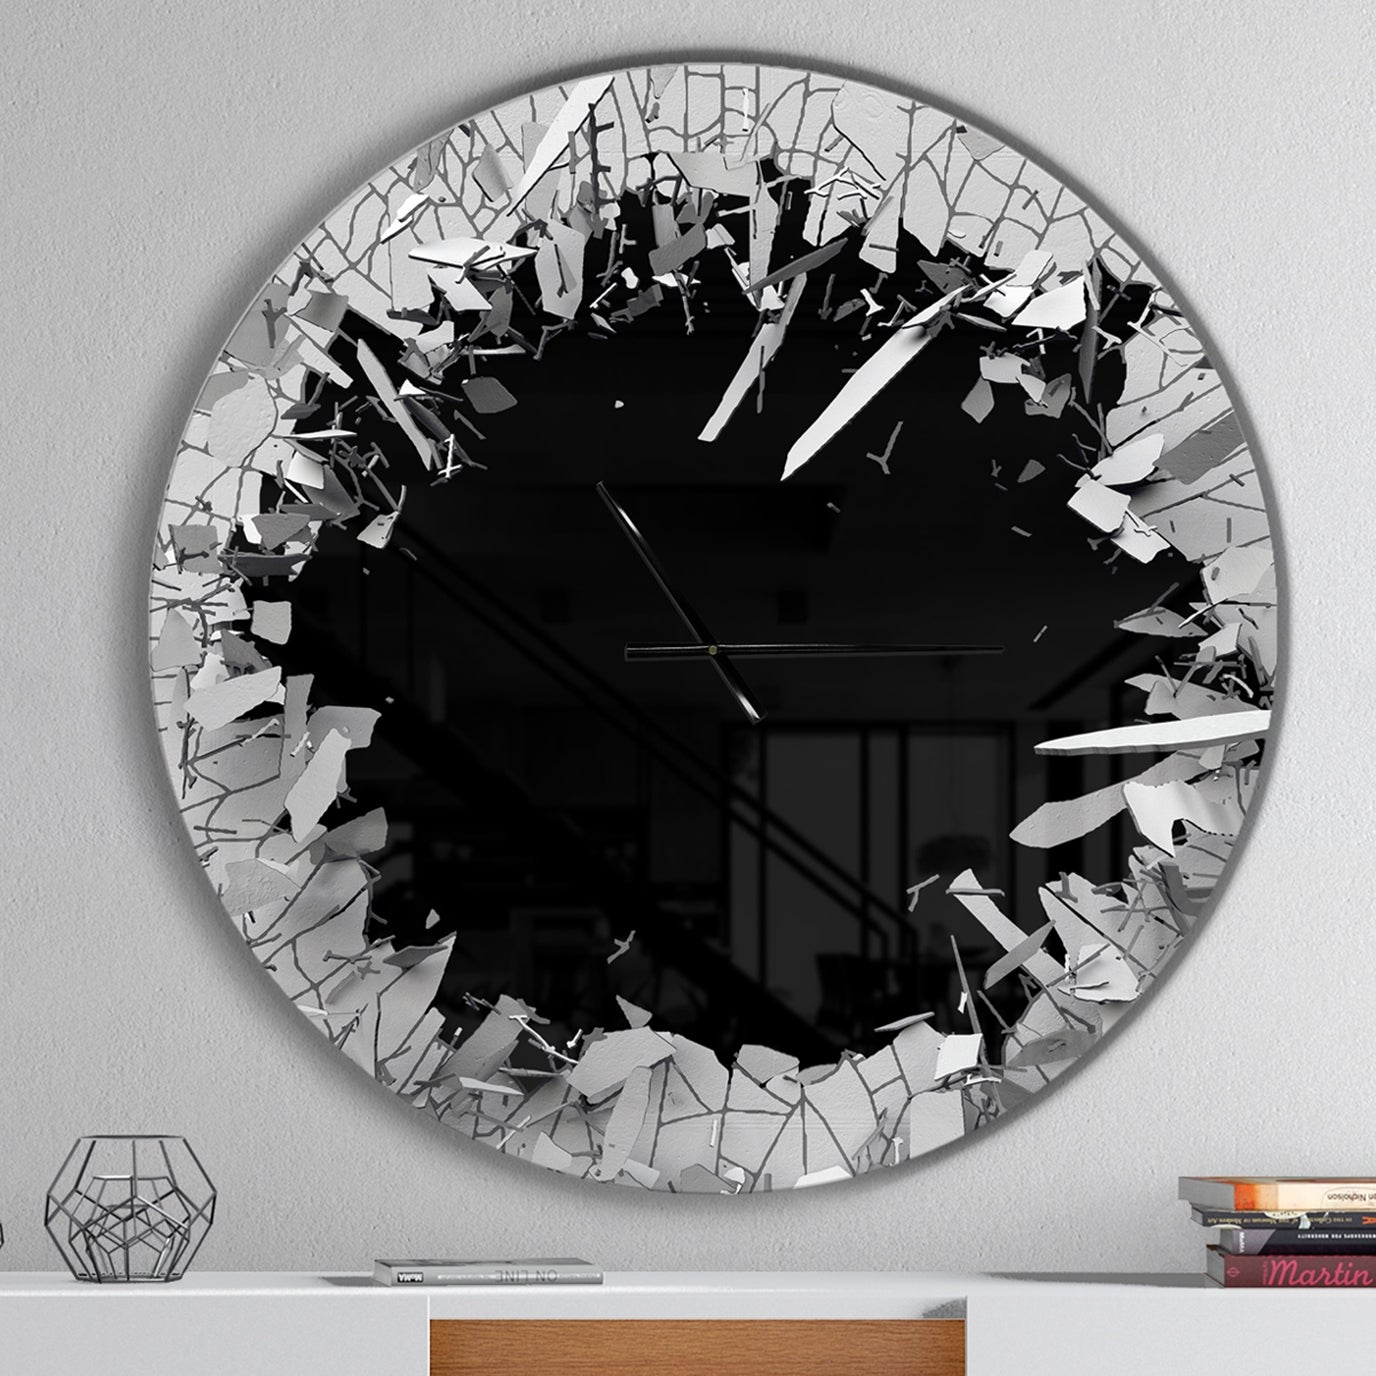 Strick Bolton Abstract Broken Wall 3d Design Metal Clock On Sale Overstock 23535022